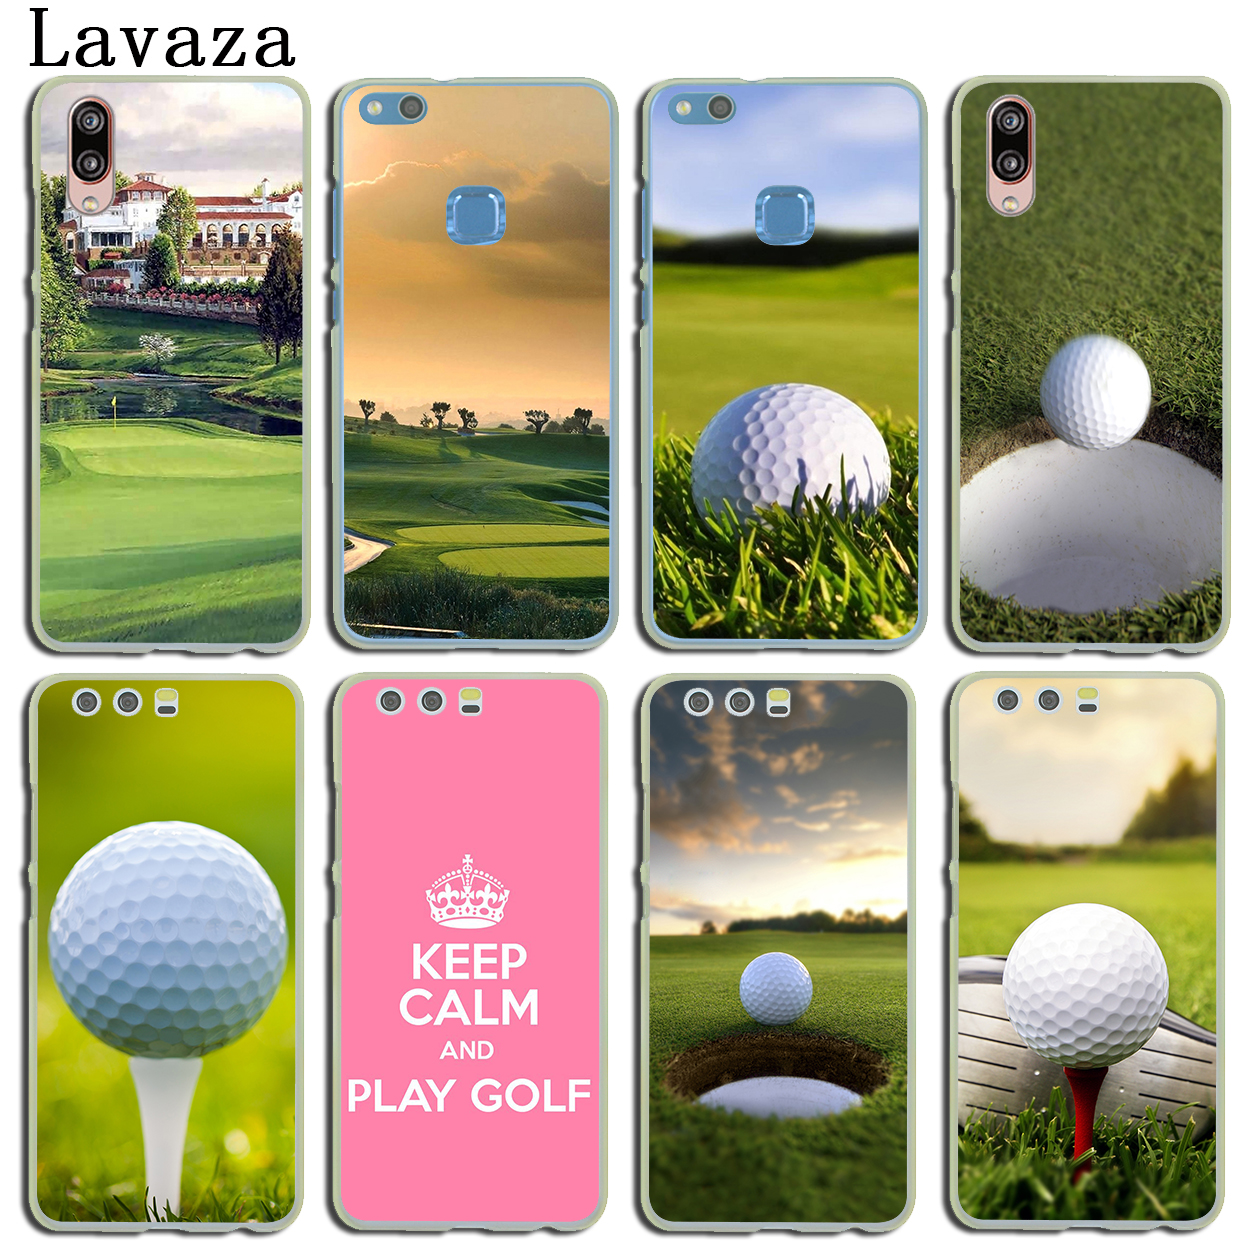 Lavaza Golf Sports Hard Phone Cover Case for Huawei P20 P10 P9 Plus P8 Lite Mini 2015 2016 2017 P smart Mate 9 10 Lite Pro